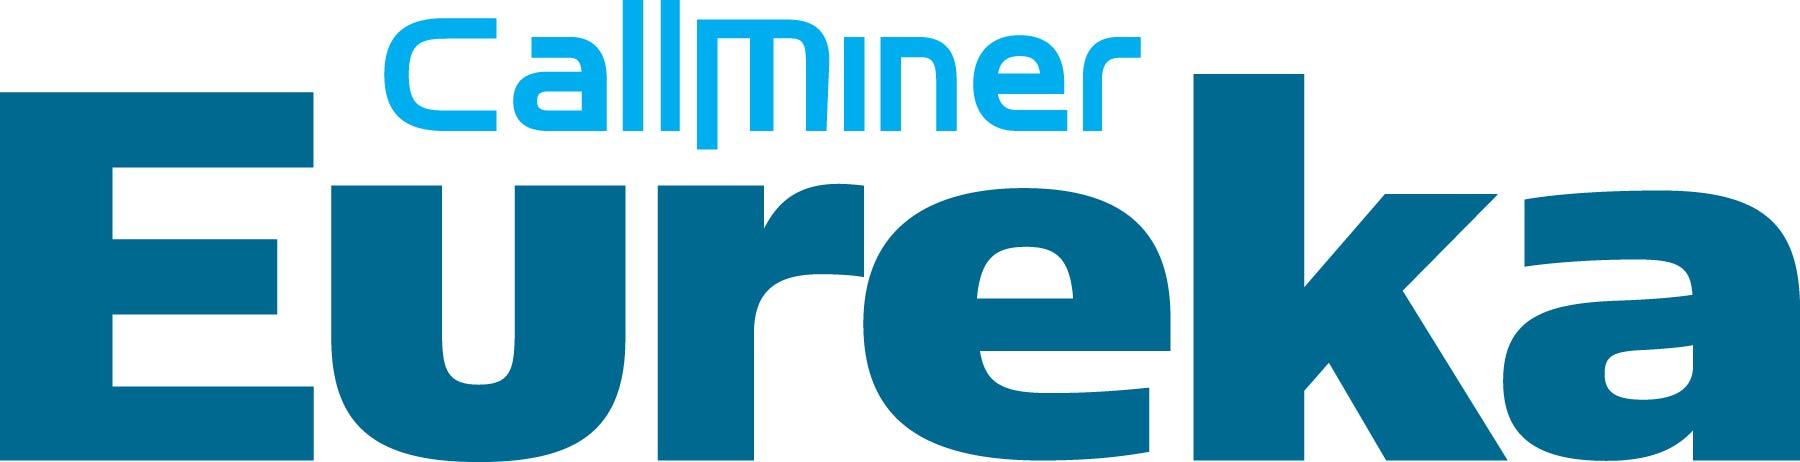 callminer_eureka_new logo_11-17-16